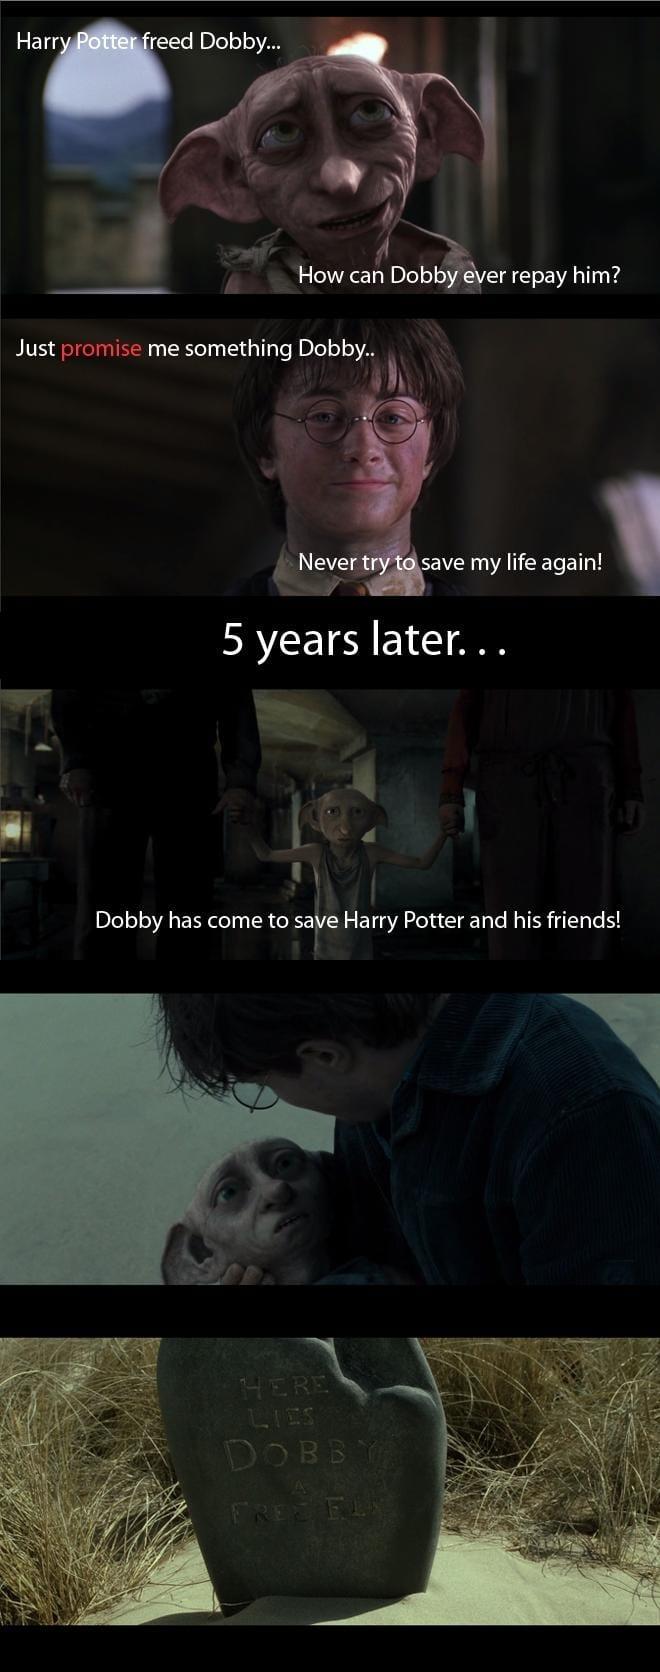 dobby-repays-harry-potter